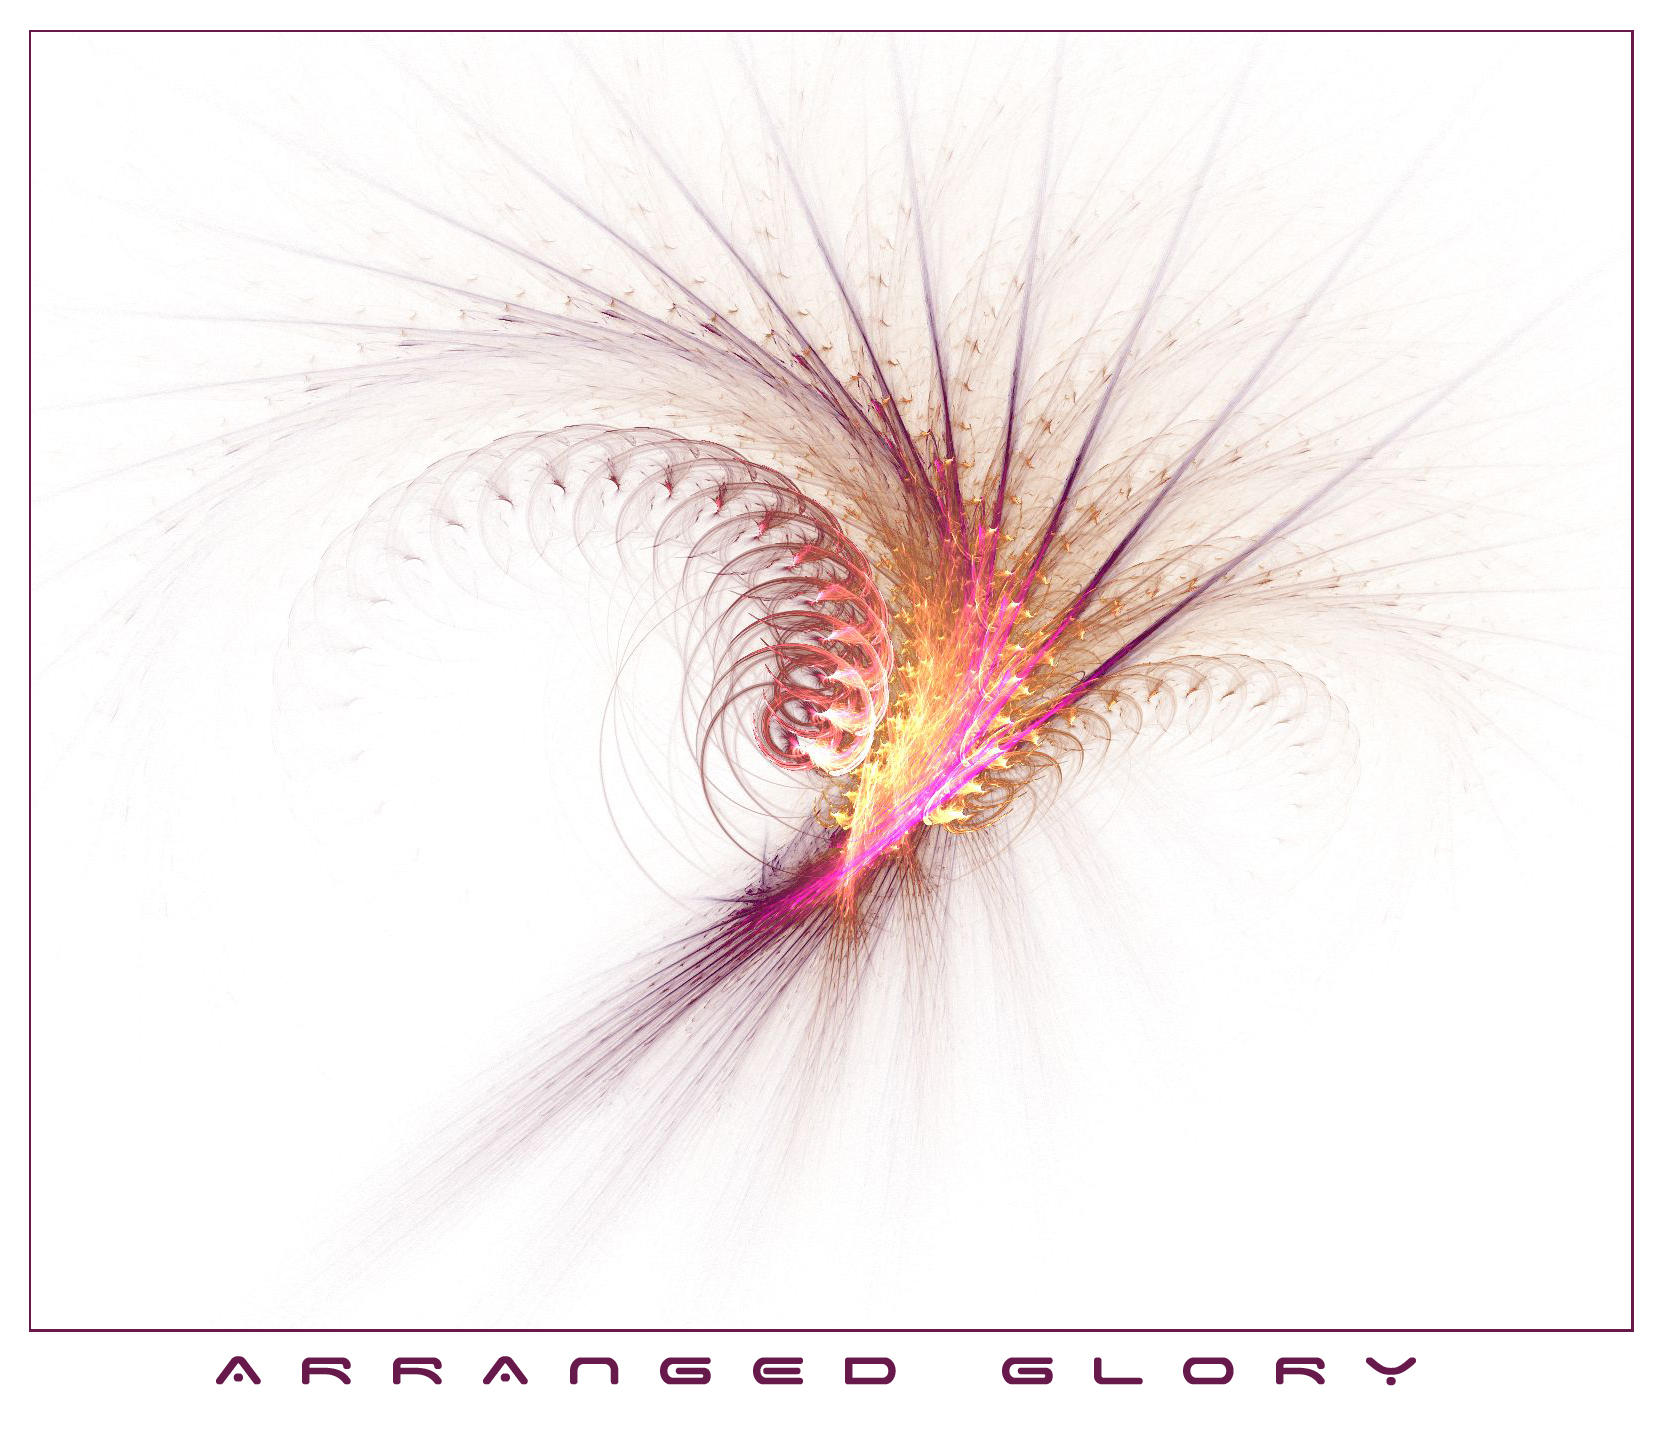 ARRANGED GLORY by DeepChrome